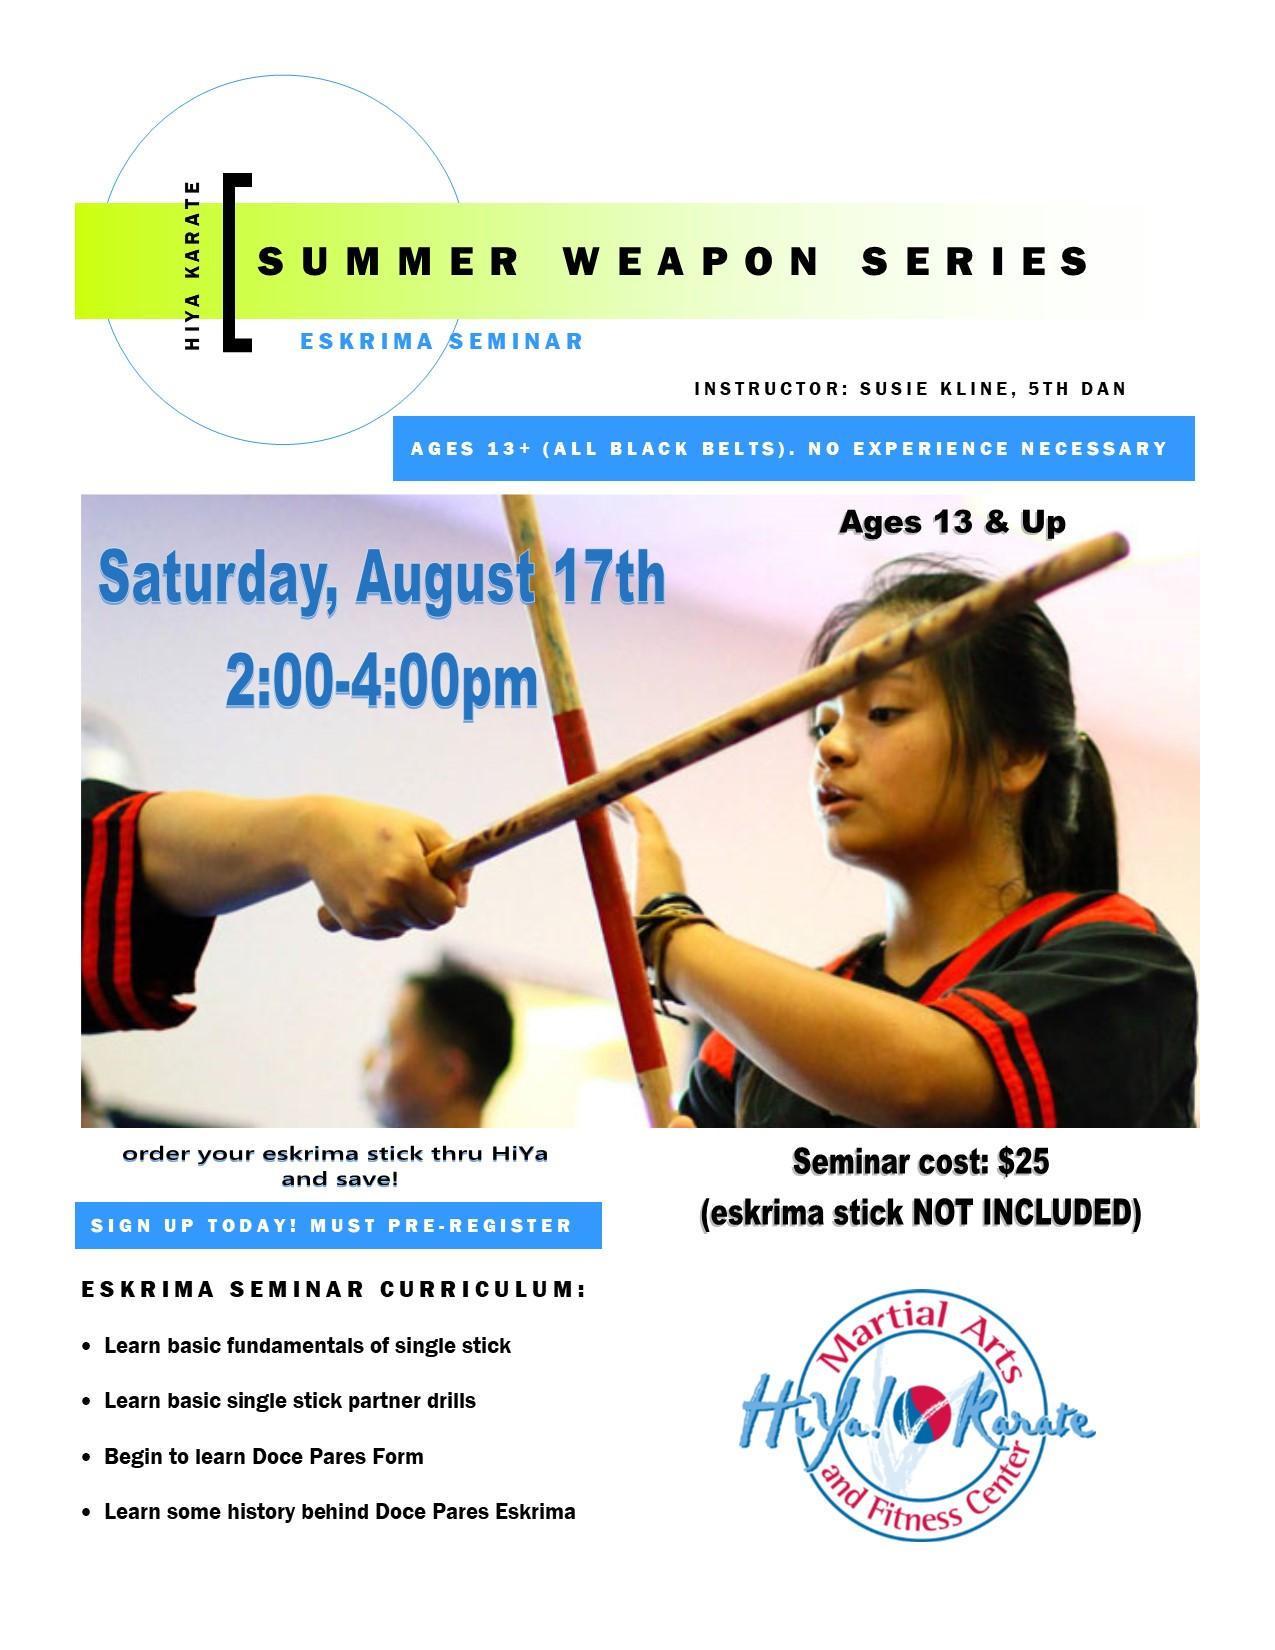 weapon seminar, eskrima.jpg